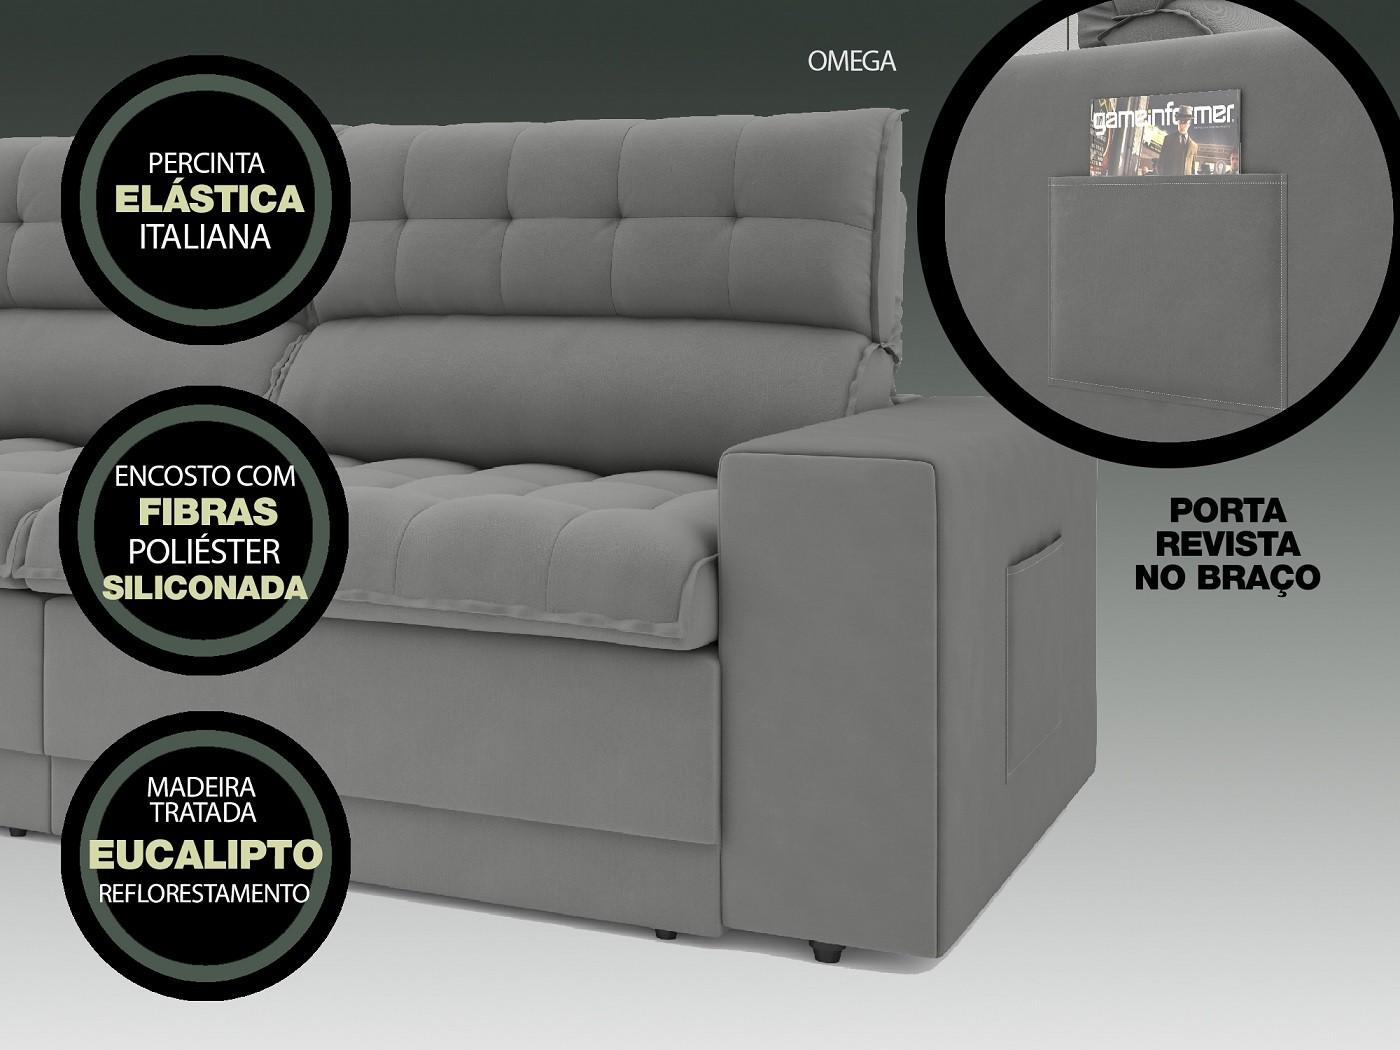 Sofá Omega 2,00m Assento Retrátil e Reclinável Velosuede Grafite - NETSOFAS  - NETSOFÁS